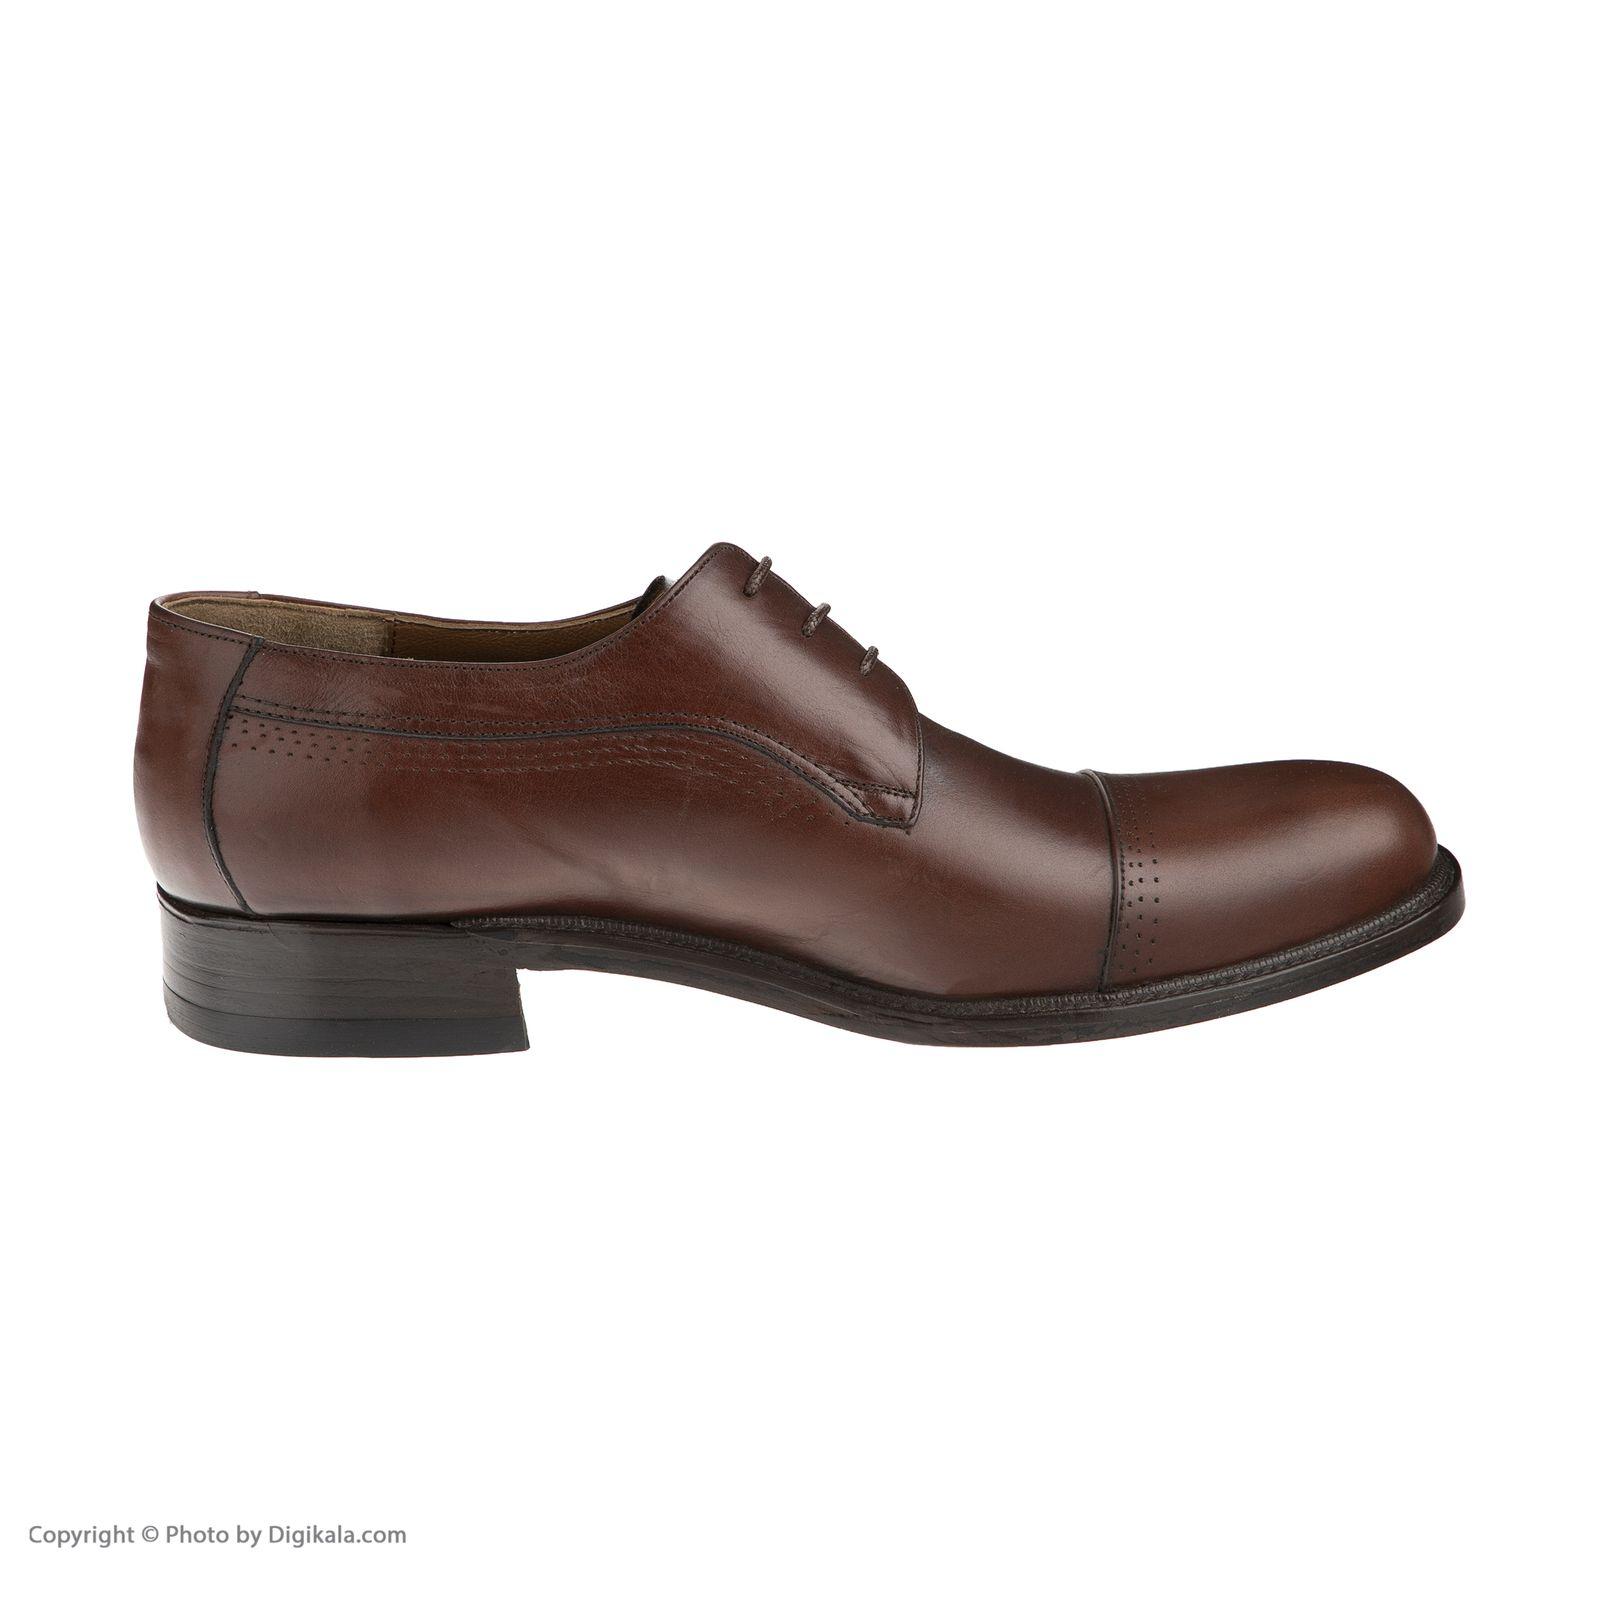 کفش مردانه نظری کد 431 -  - 2